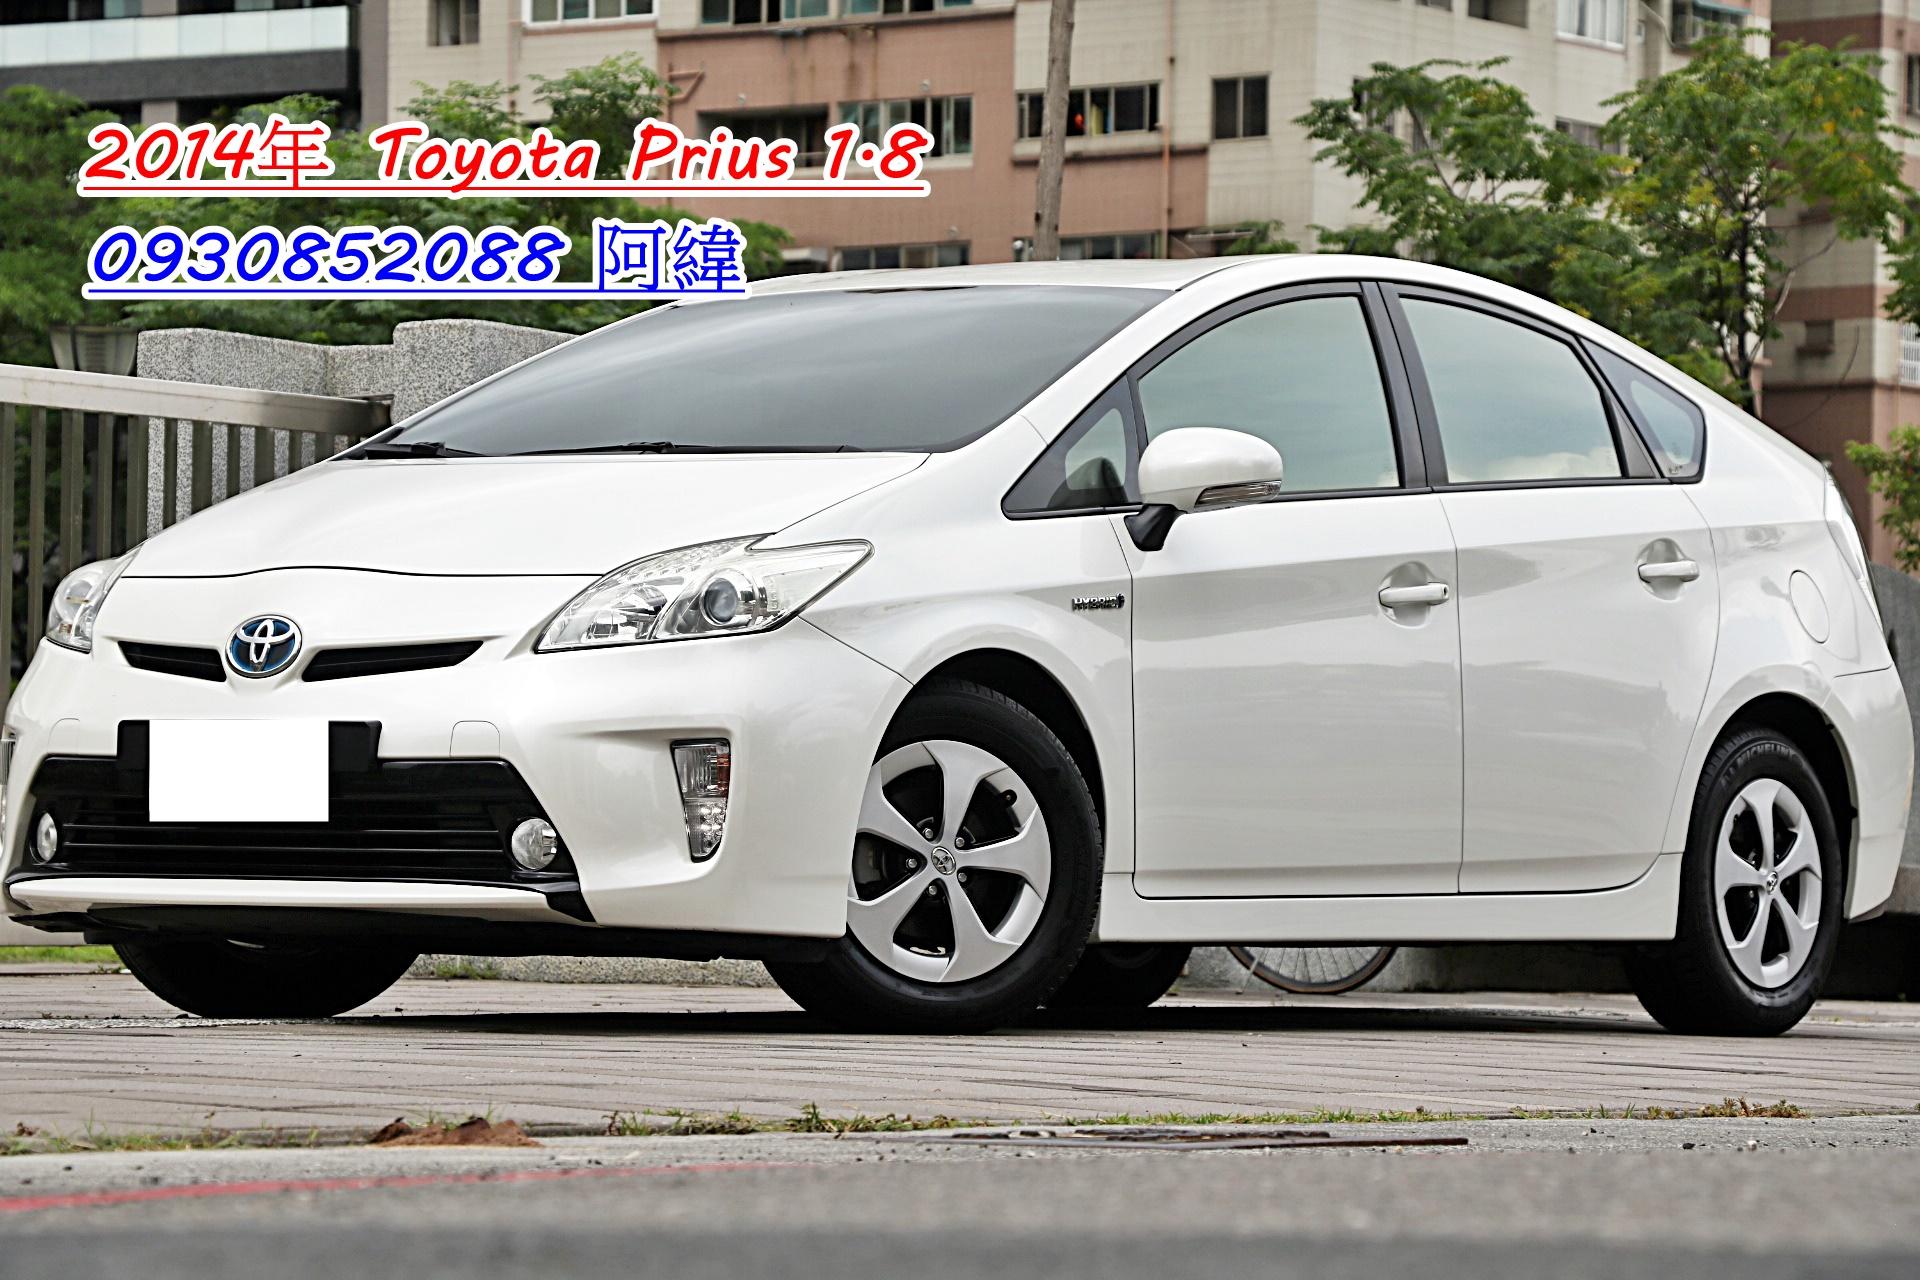 2014 Toyota 豐田 Prius